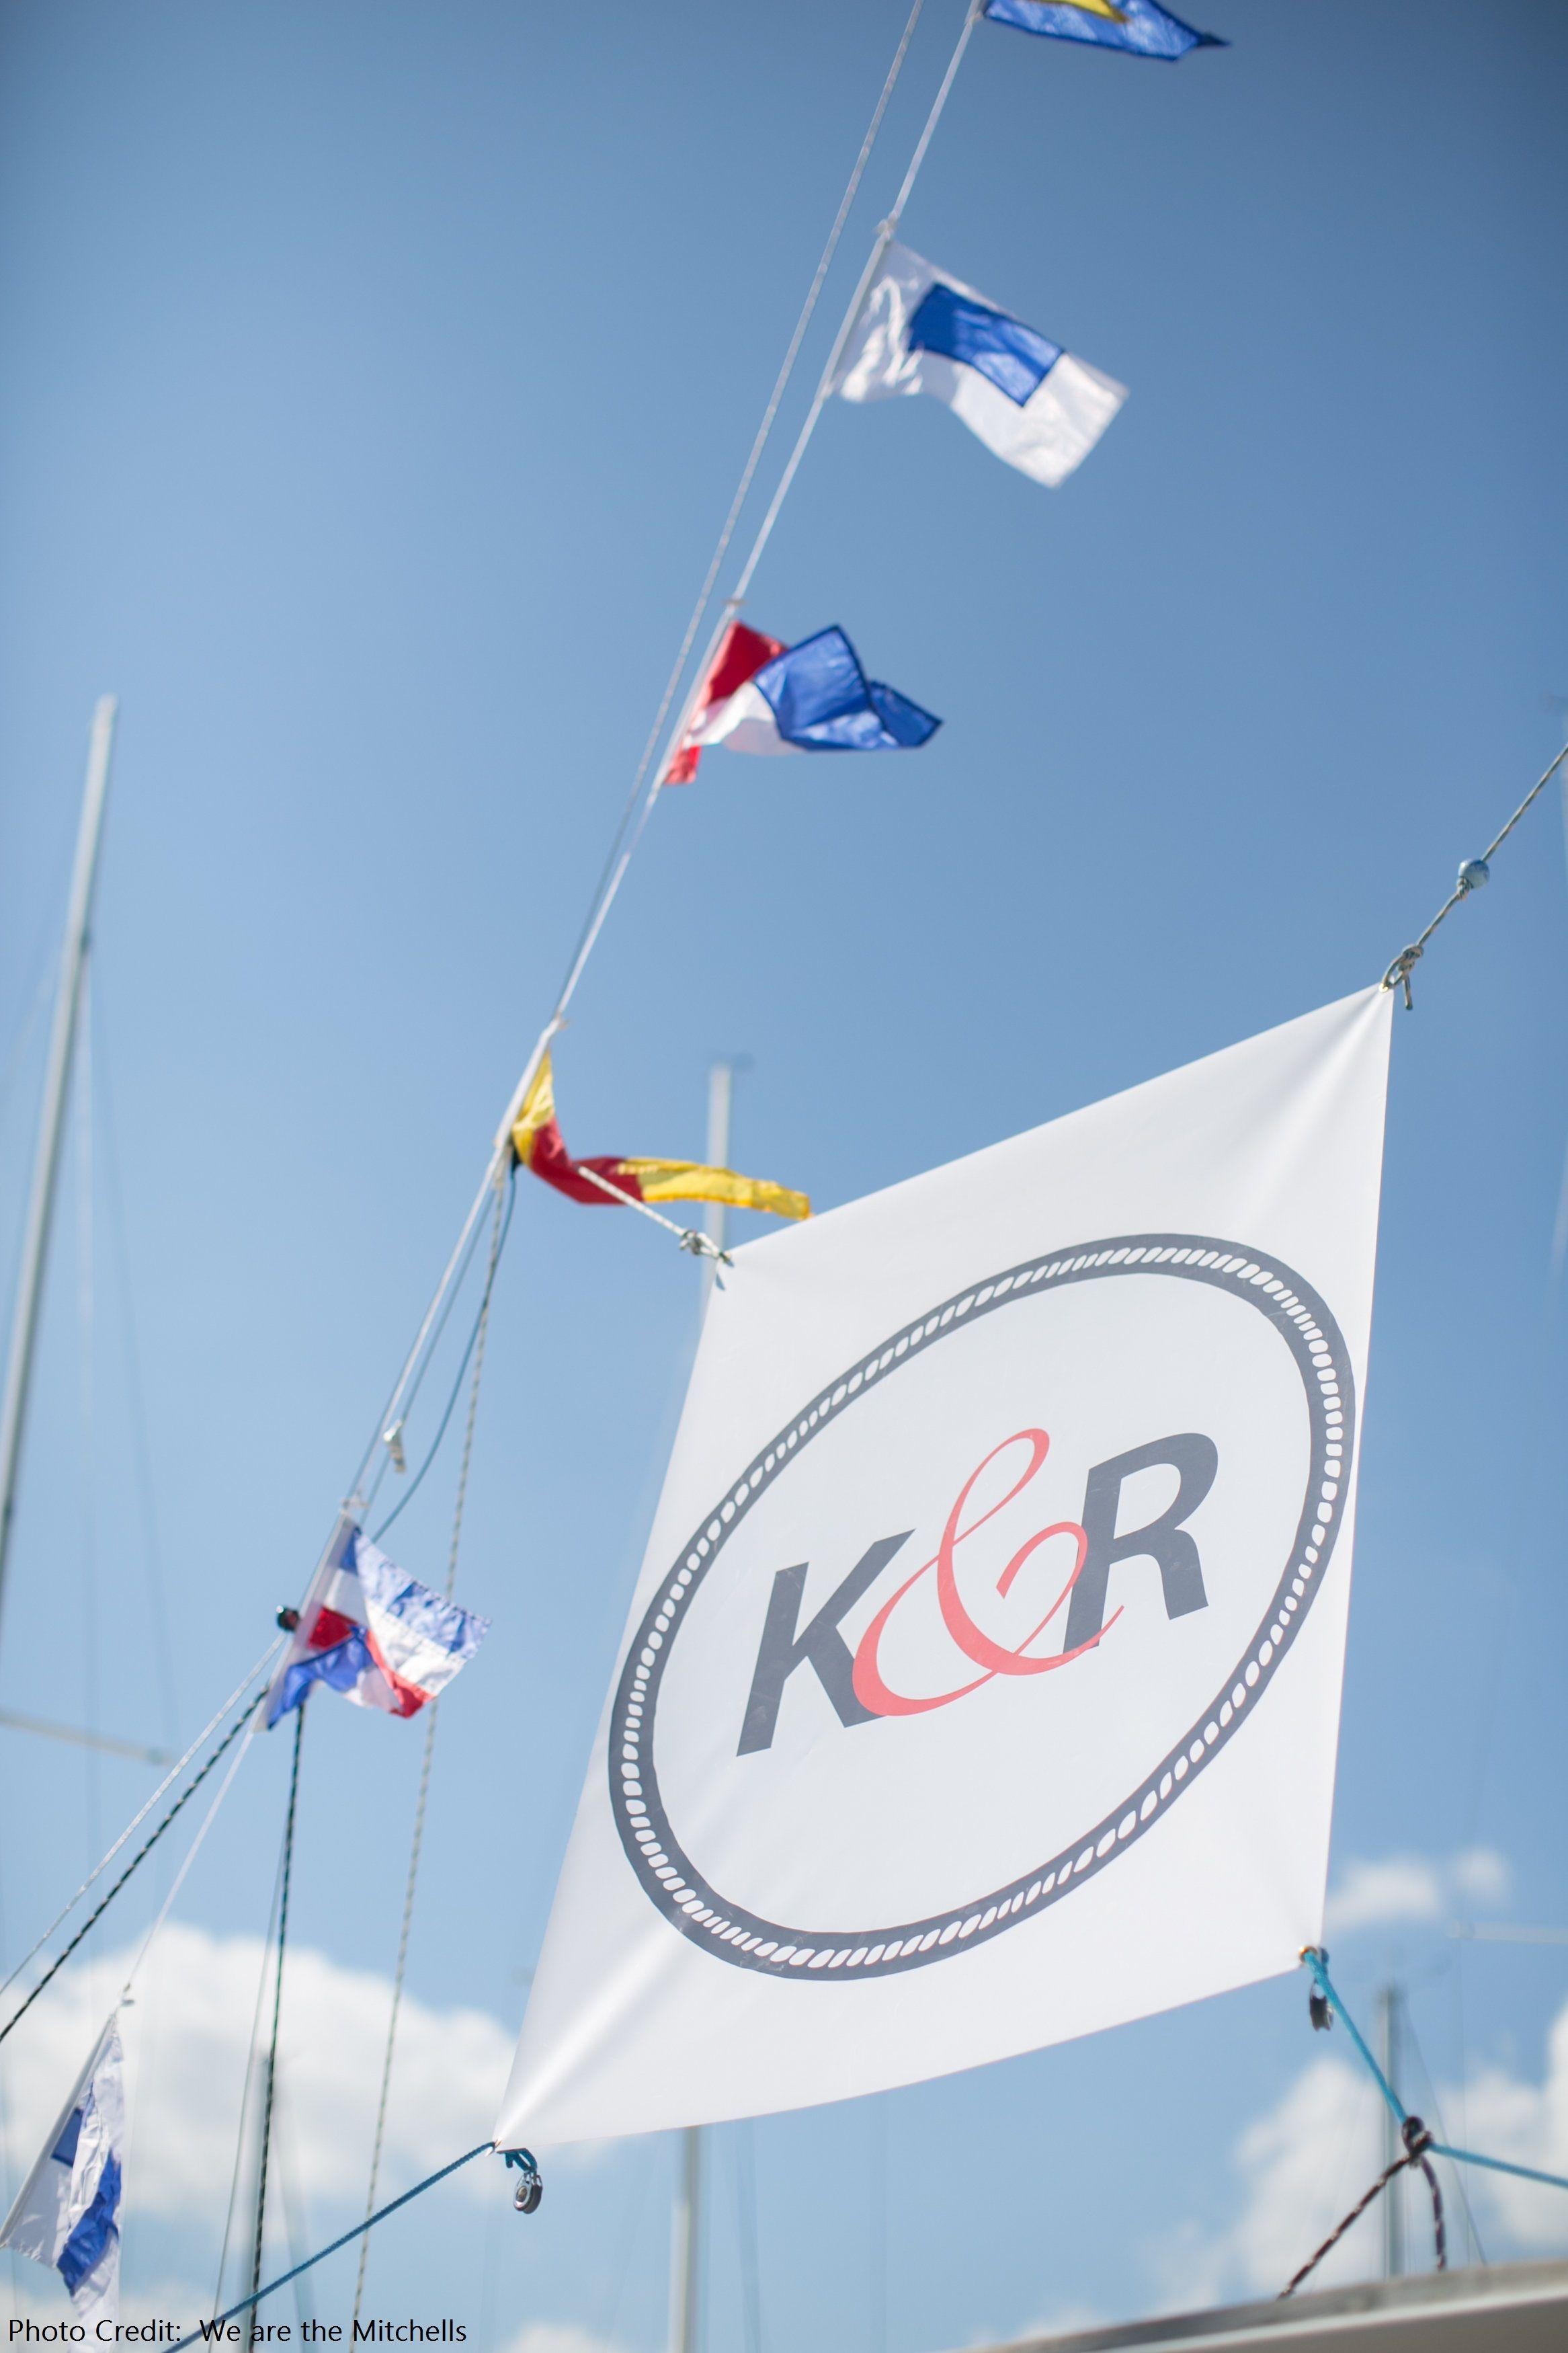 Monogram Custom Sailing Flags Pinterestdreams.blogspot.com Photo Credit:  We are the Mitchells